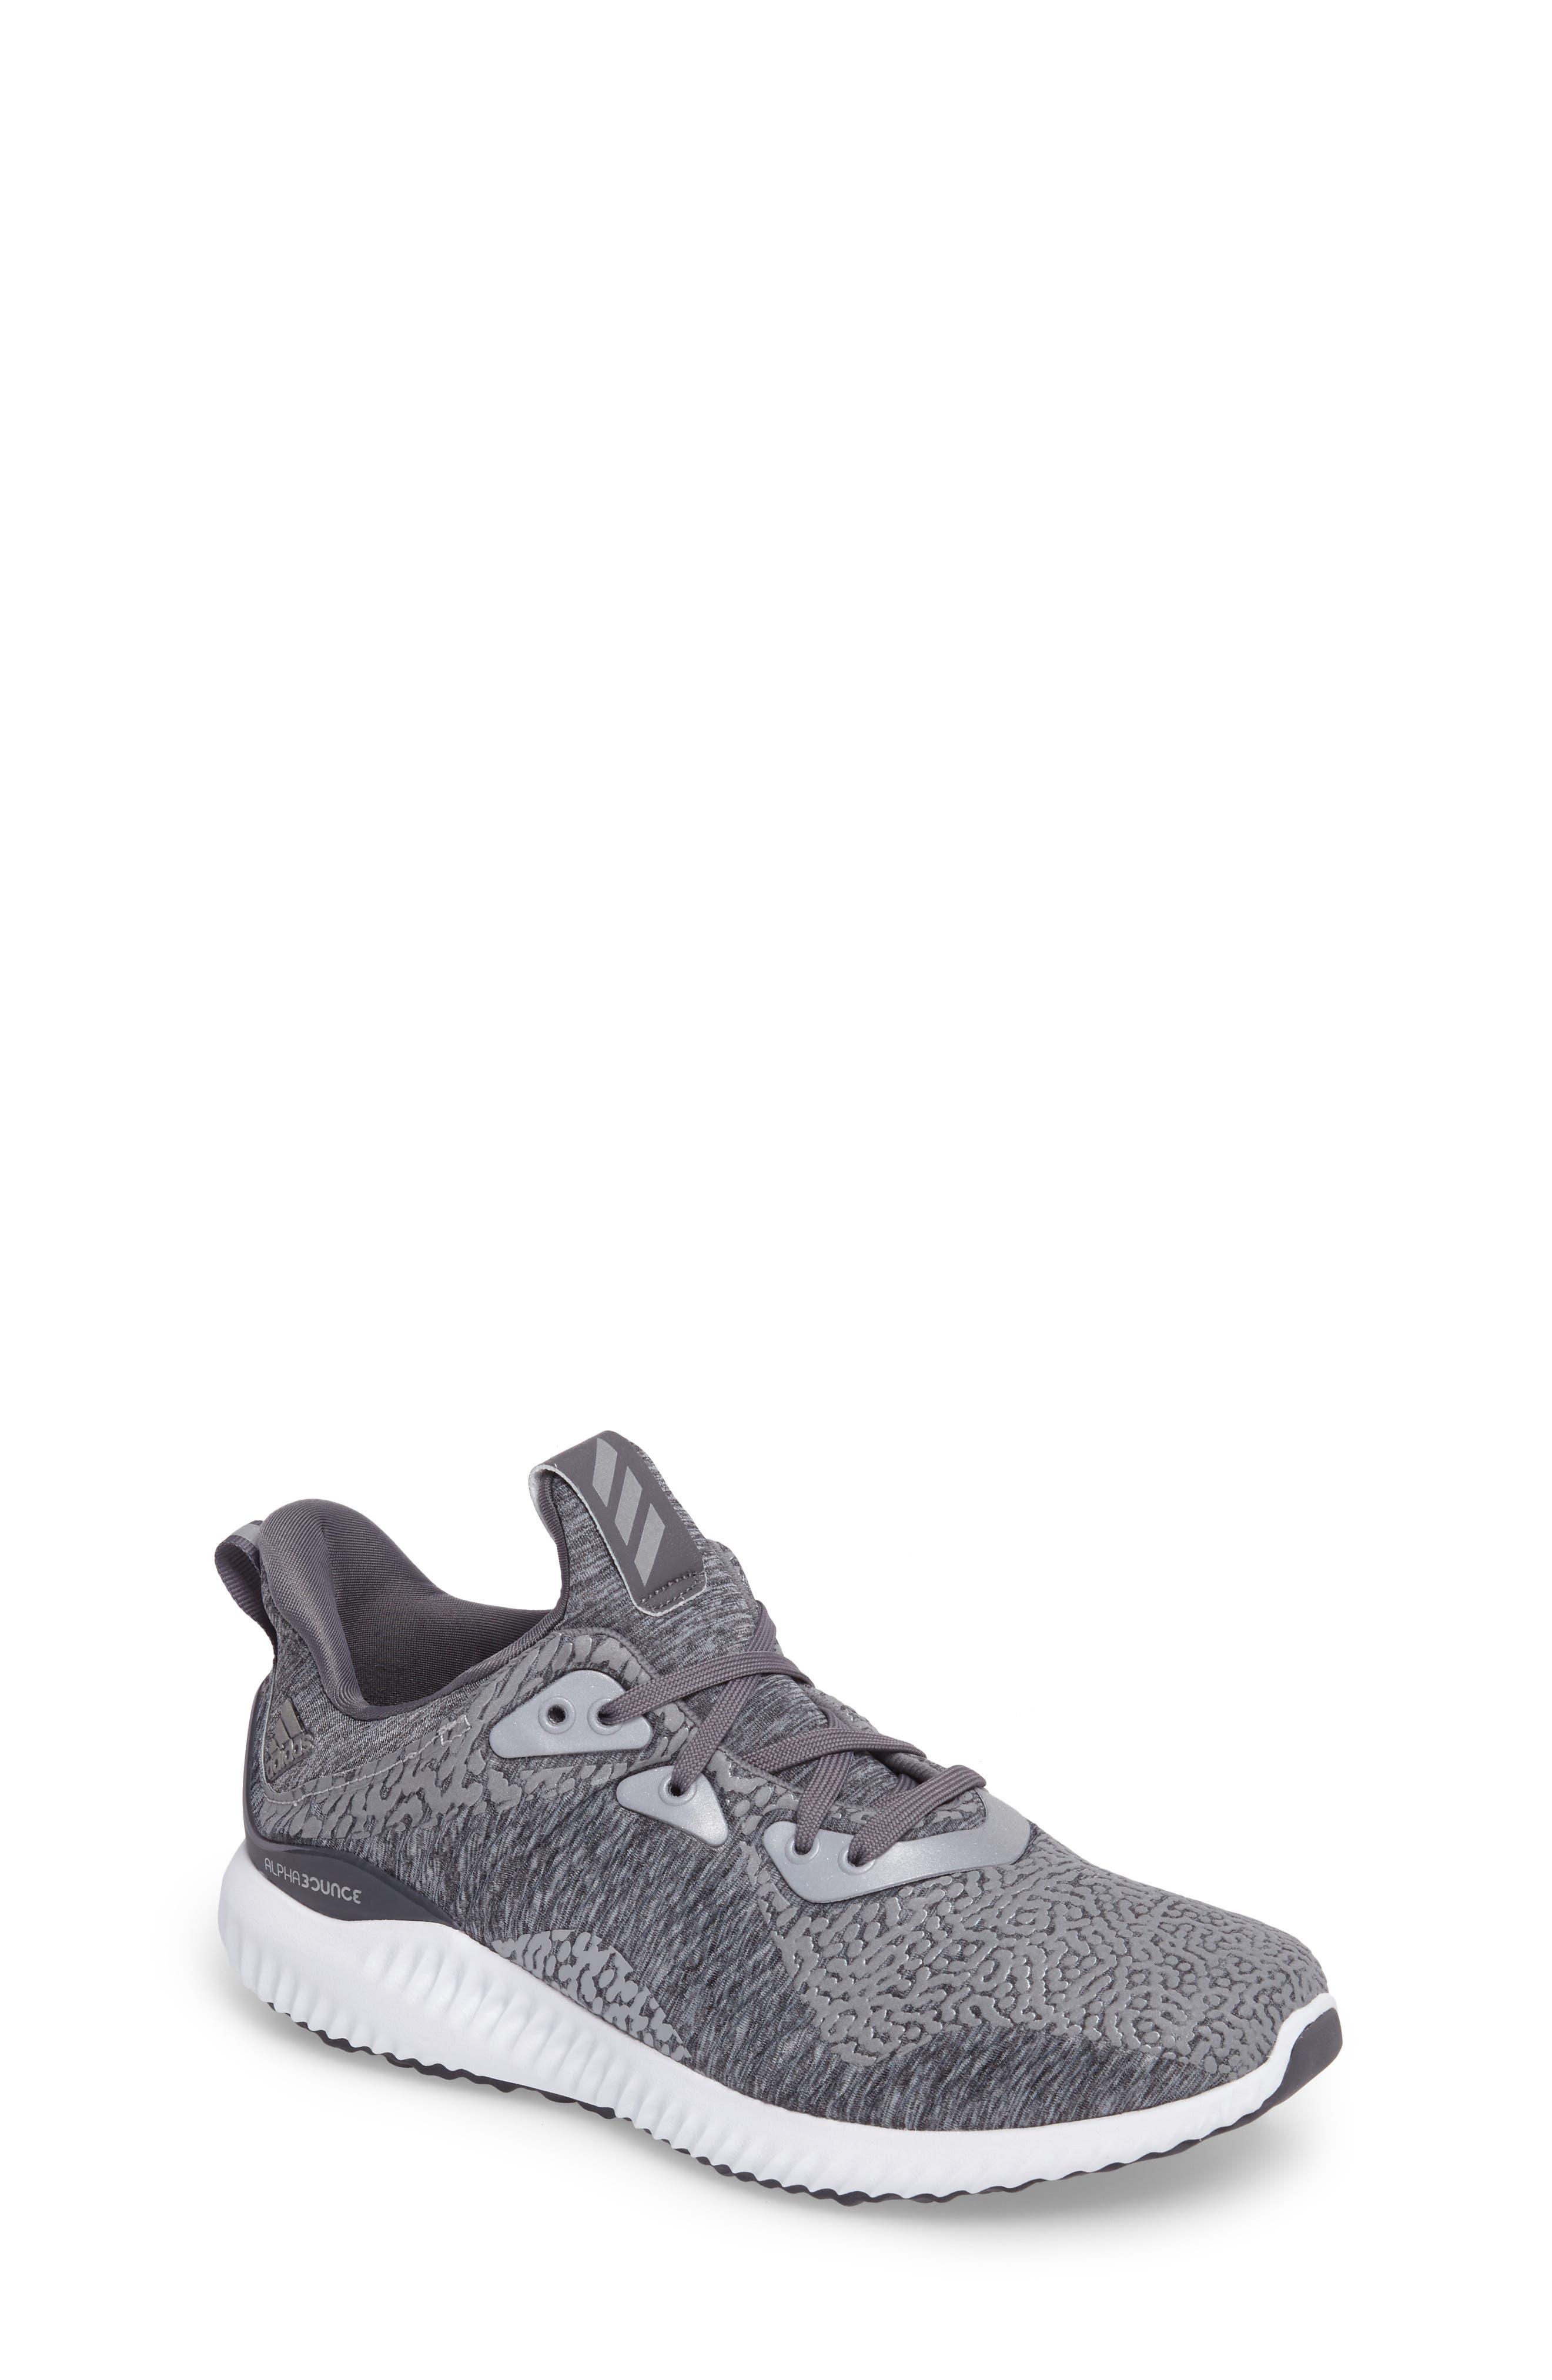 AlphaBounce Sneaker,                         Main,                         color, 035